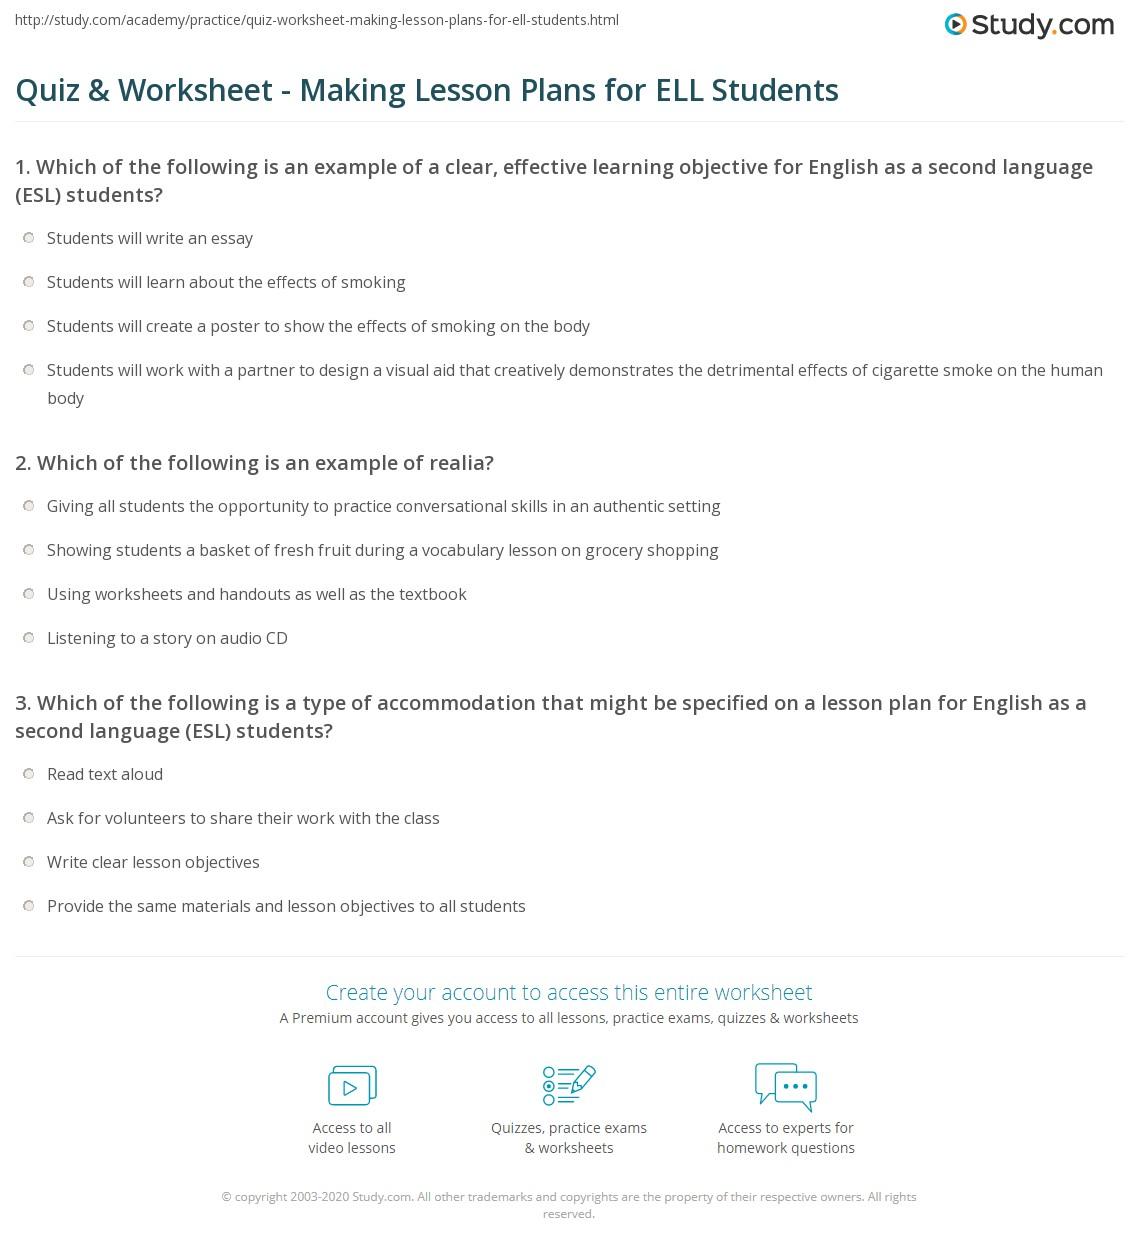 Quiz & Worksheet - Making Lesson Plans for ELL Students